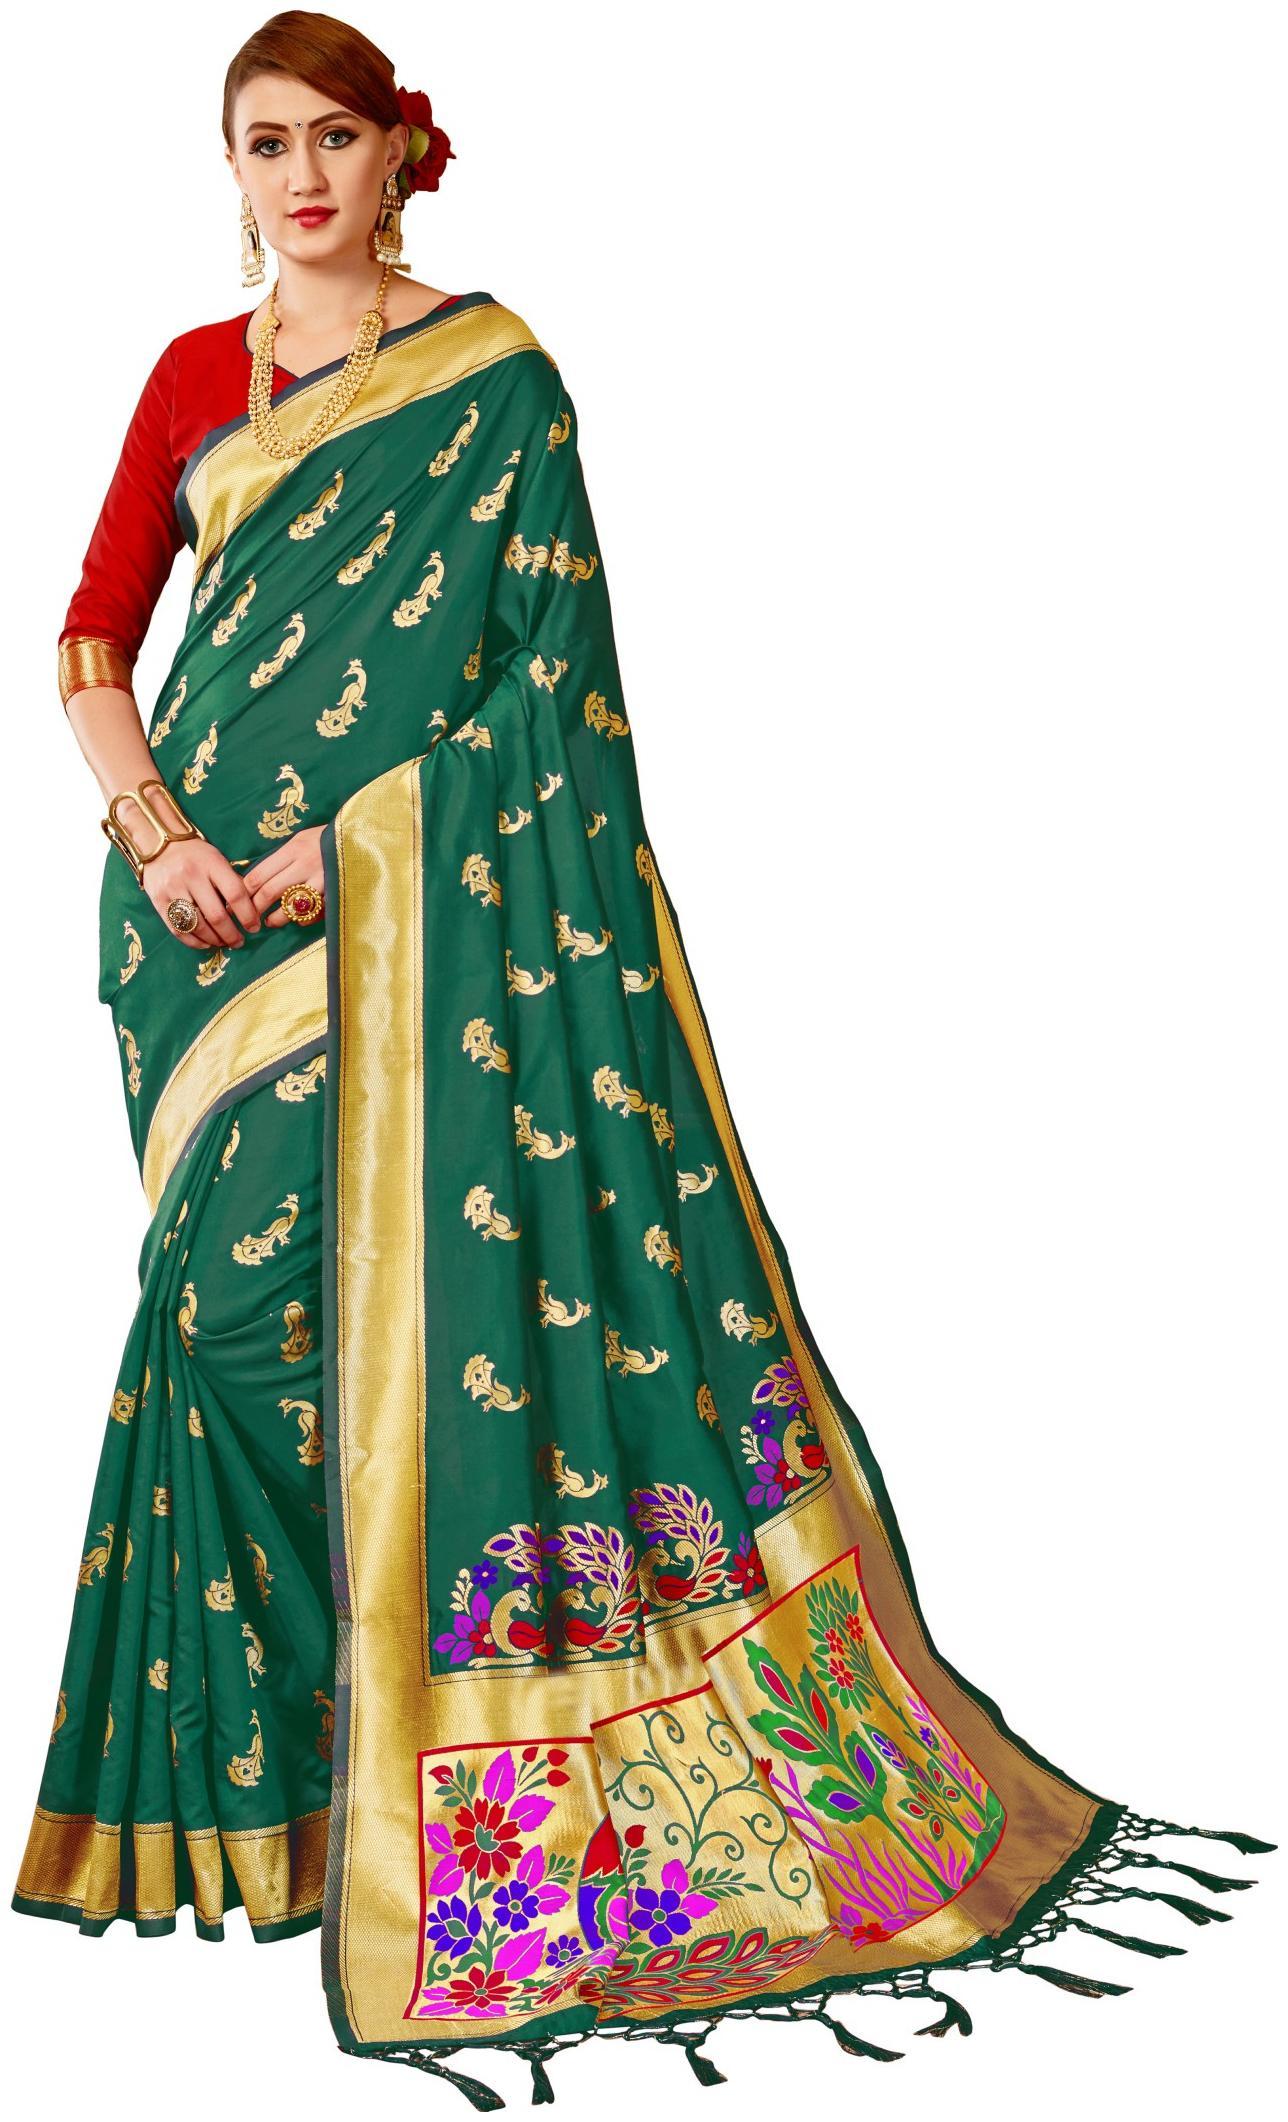 GENIUS CREATION Silk Banarasi Embroidered Work Saree - Turquoise